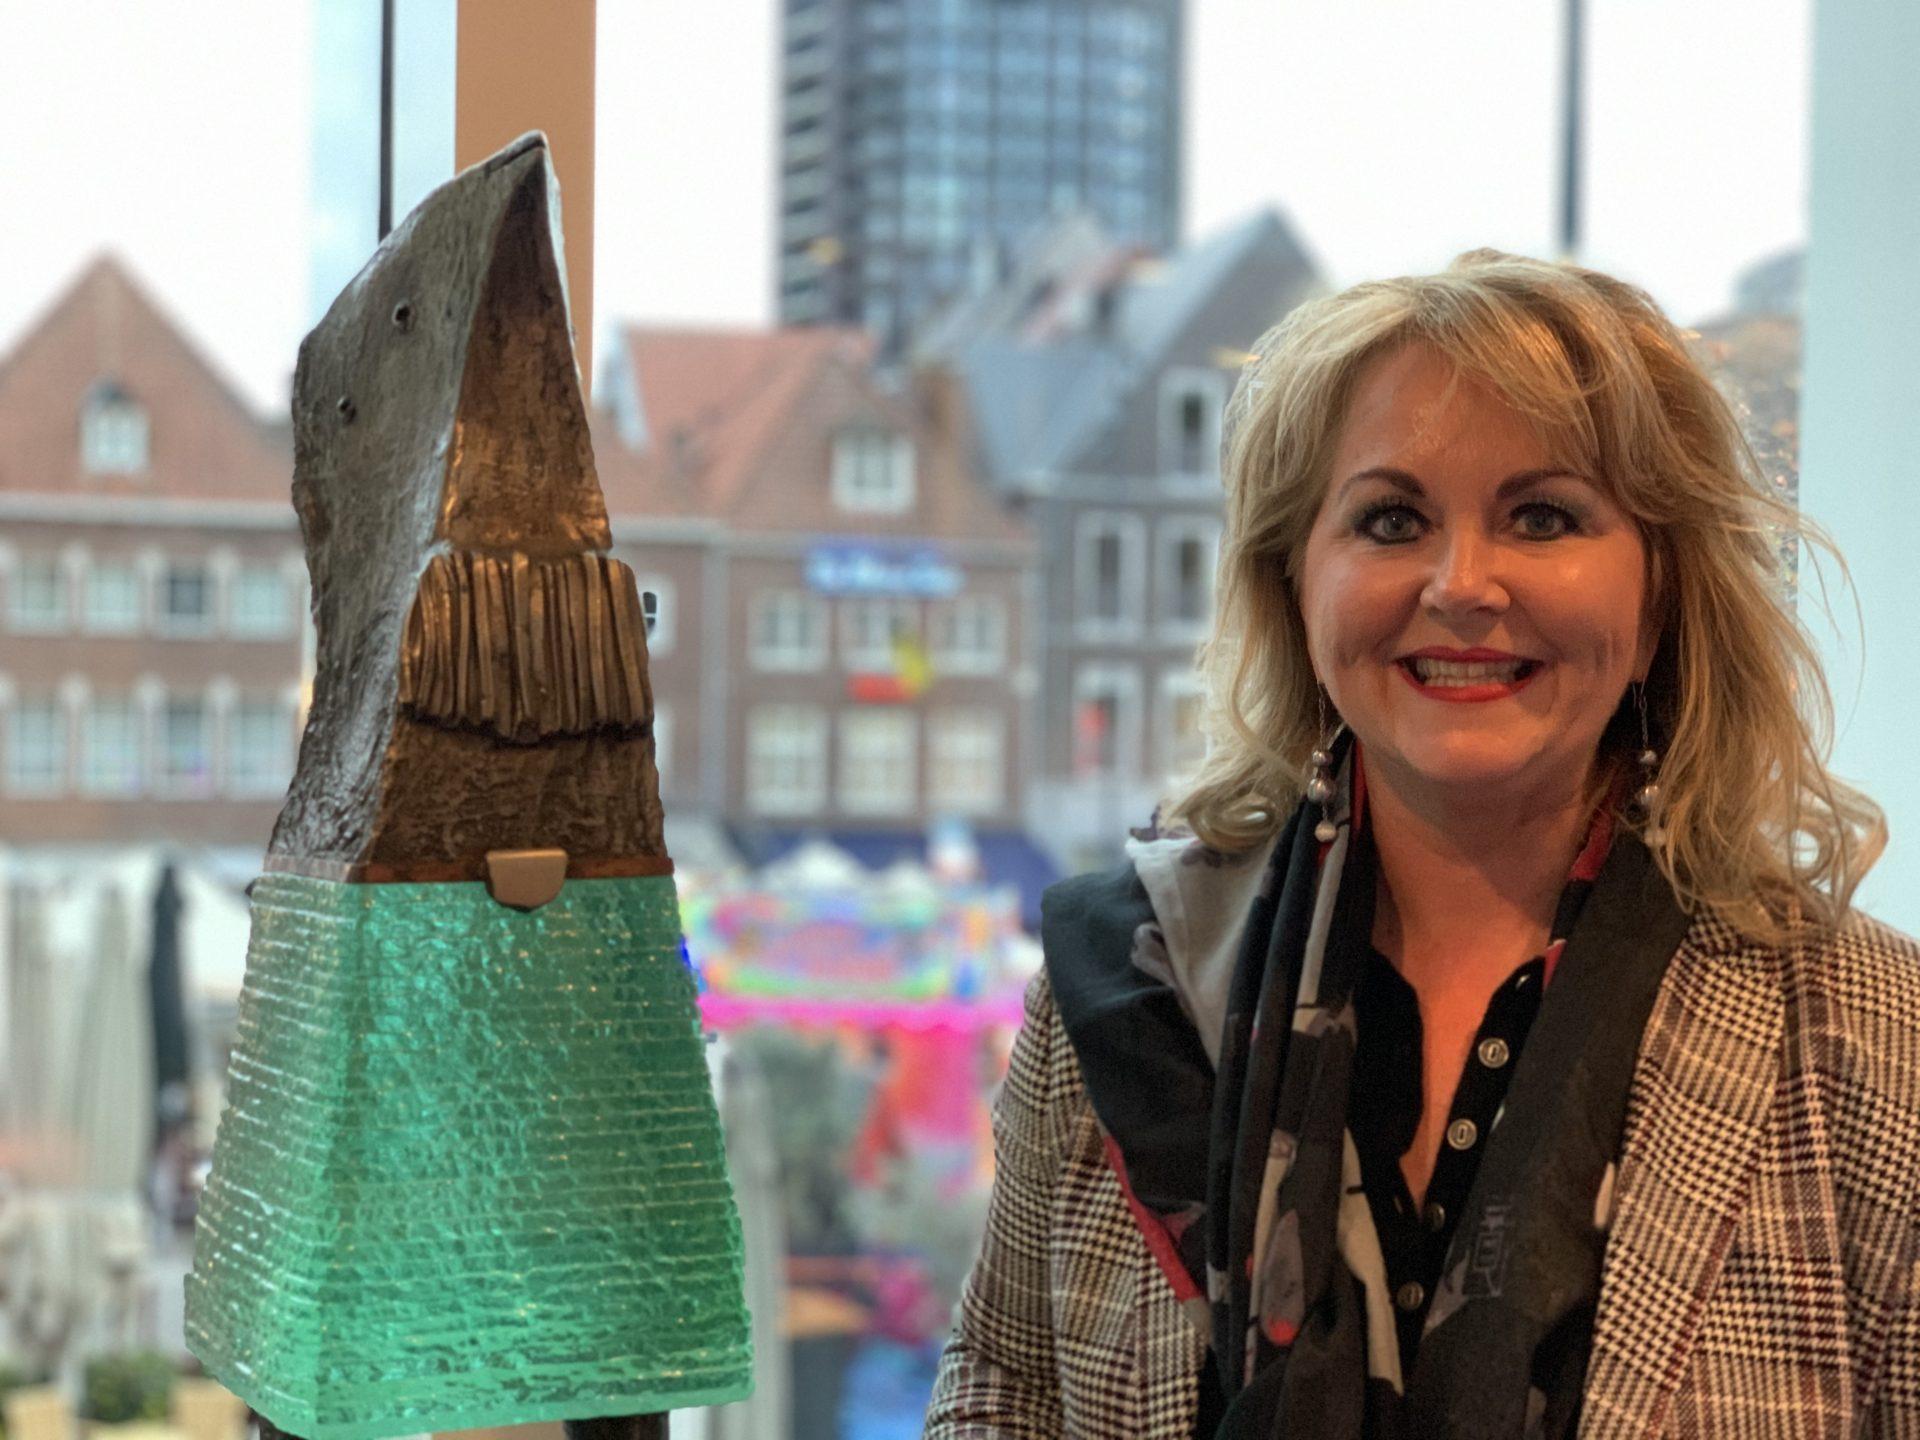 Portretfoto Lianne met groot kunstwerk brons glas bij Maaspoort Venlo